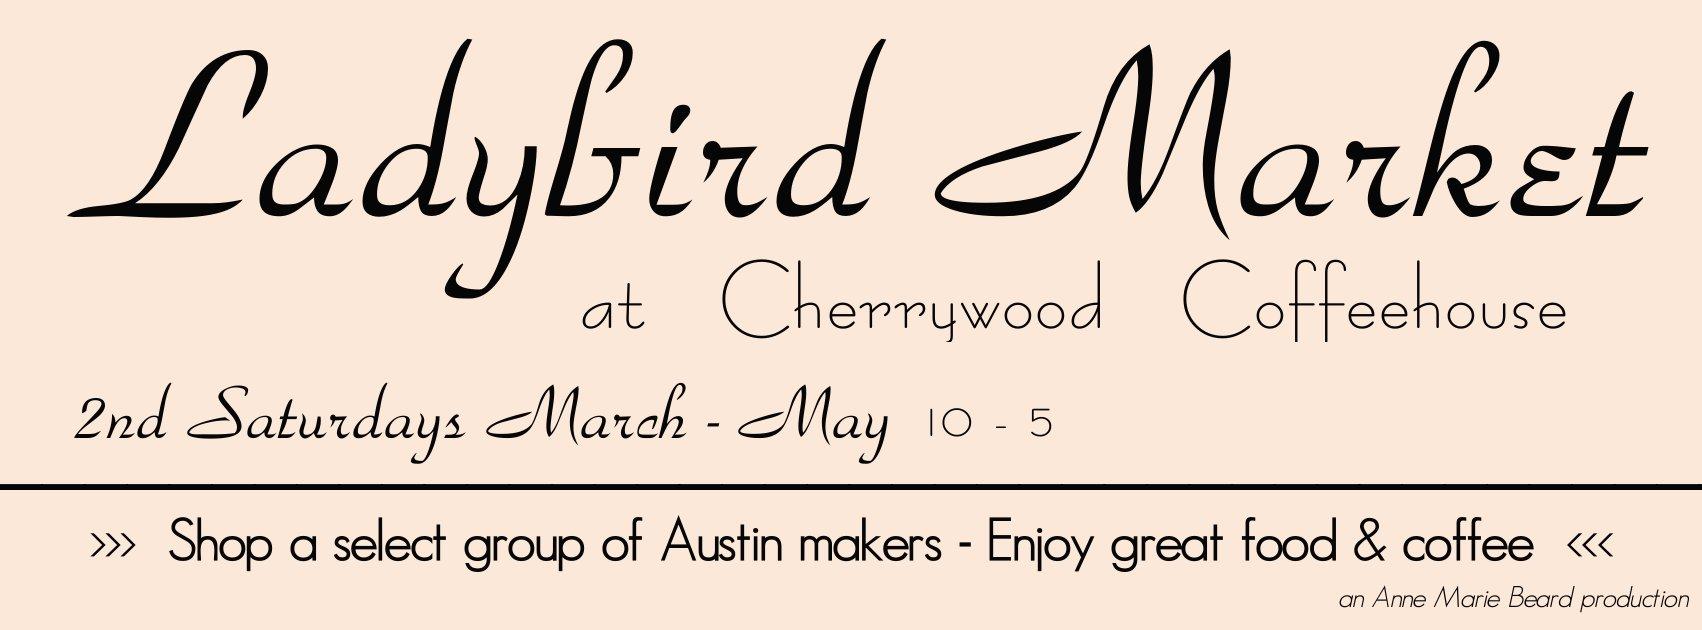 Ladybird web banner